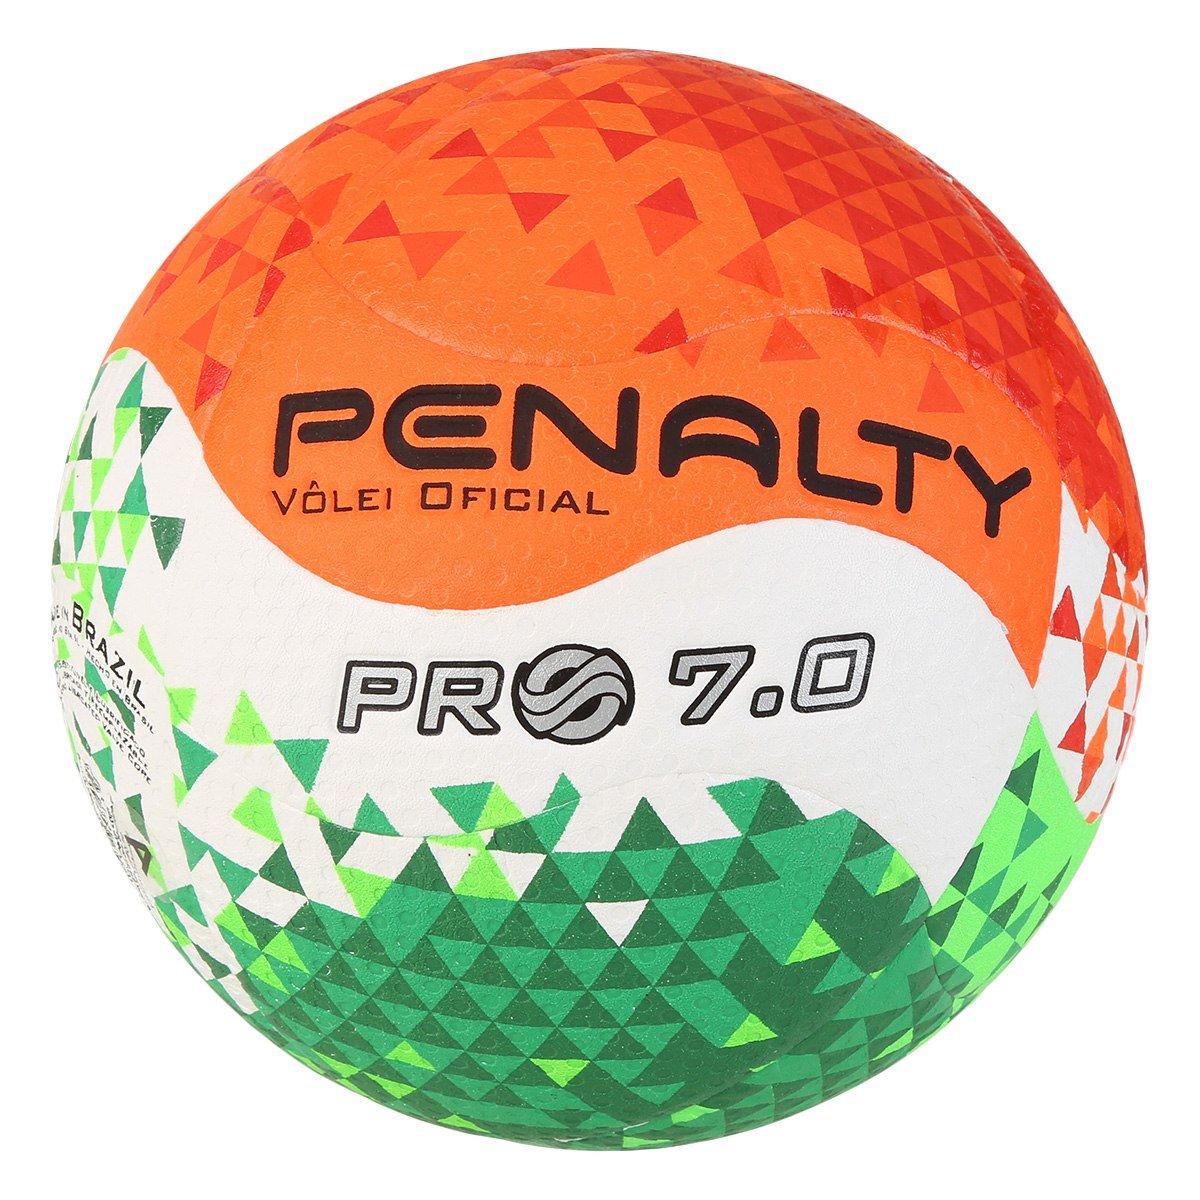 Bola de Vôlei Penalty 7.0 Pro VIII 19f552b56746f